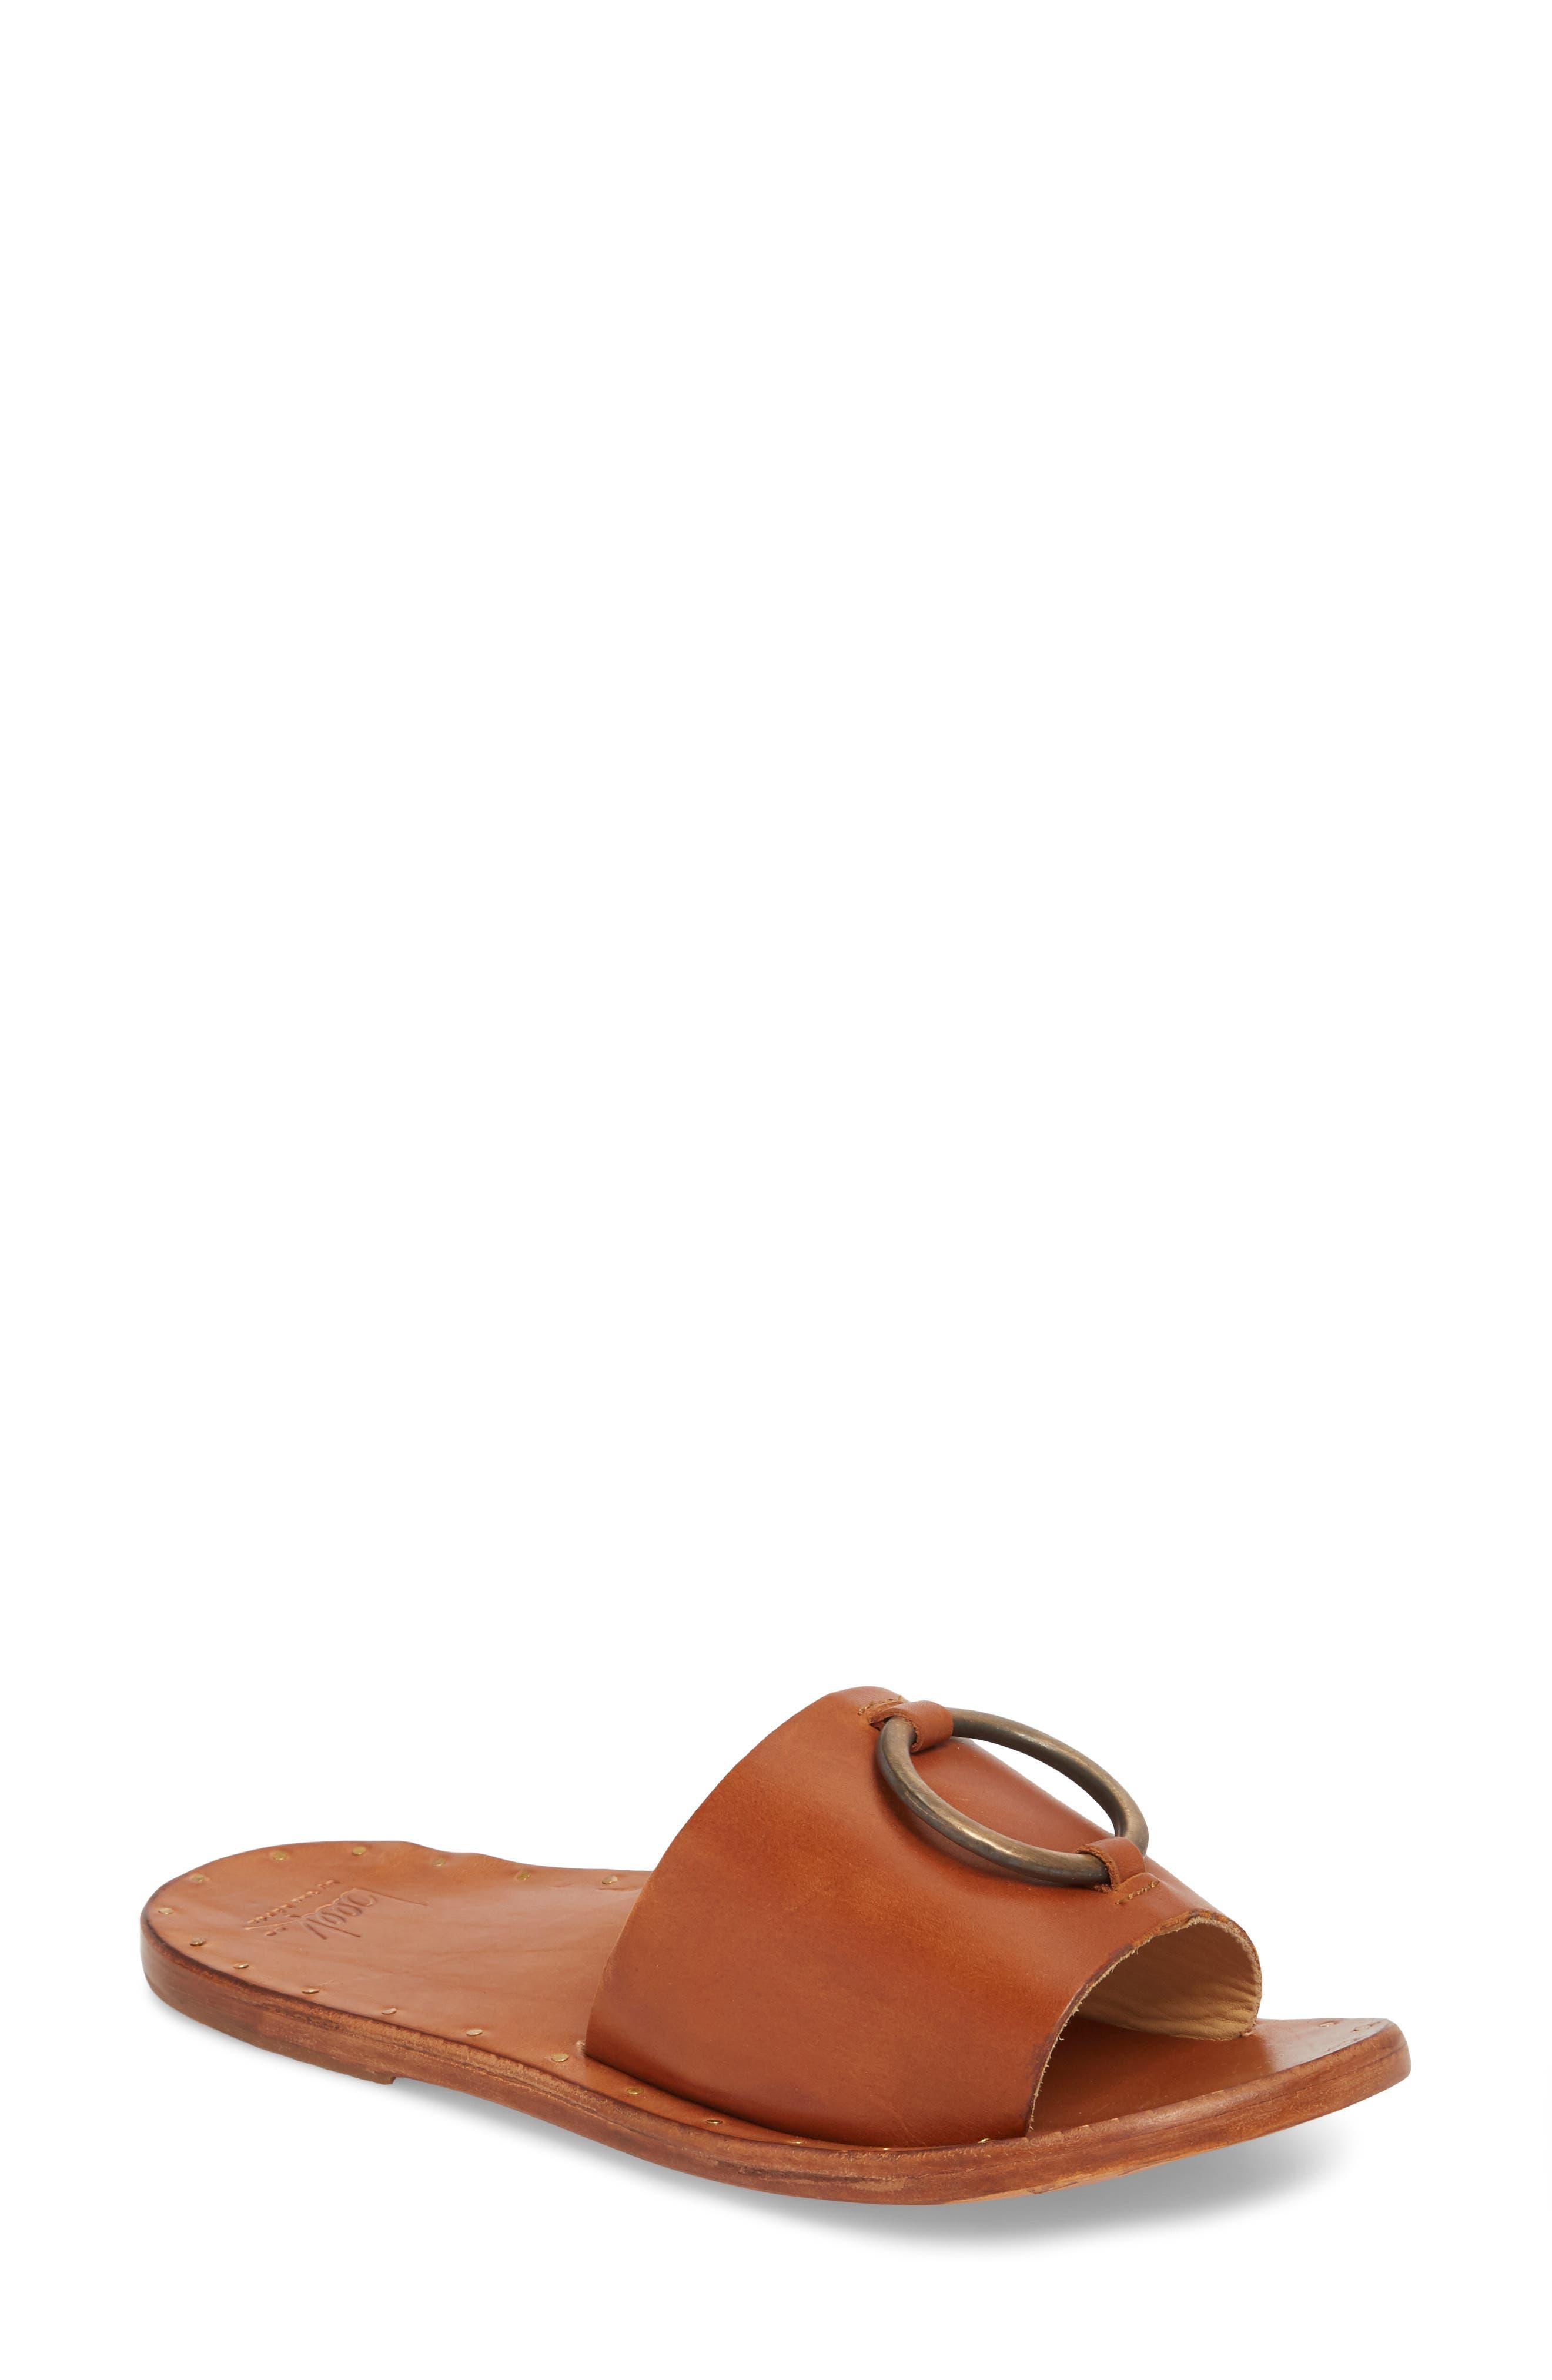 Cockatoo Slide Sandal,                         Main,                         color,